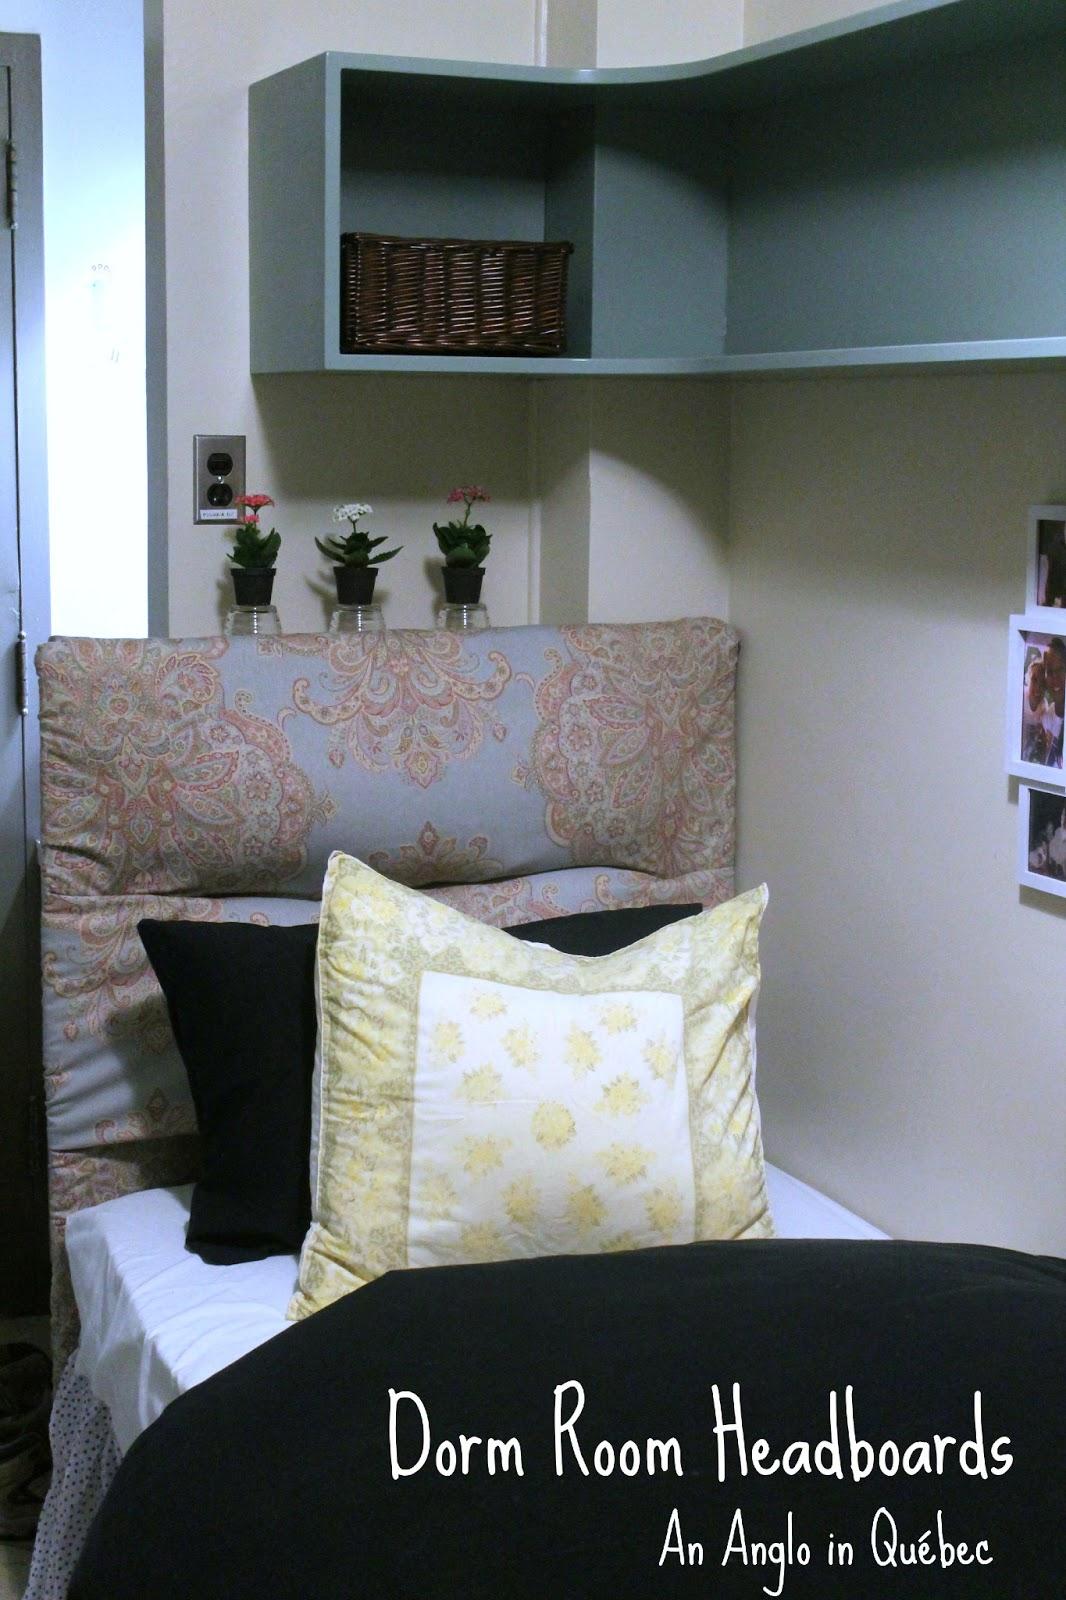 Dorm Room Headboards: An Anglo In Québec: Dorm Room Decorating